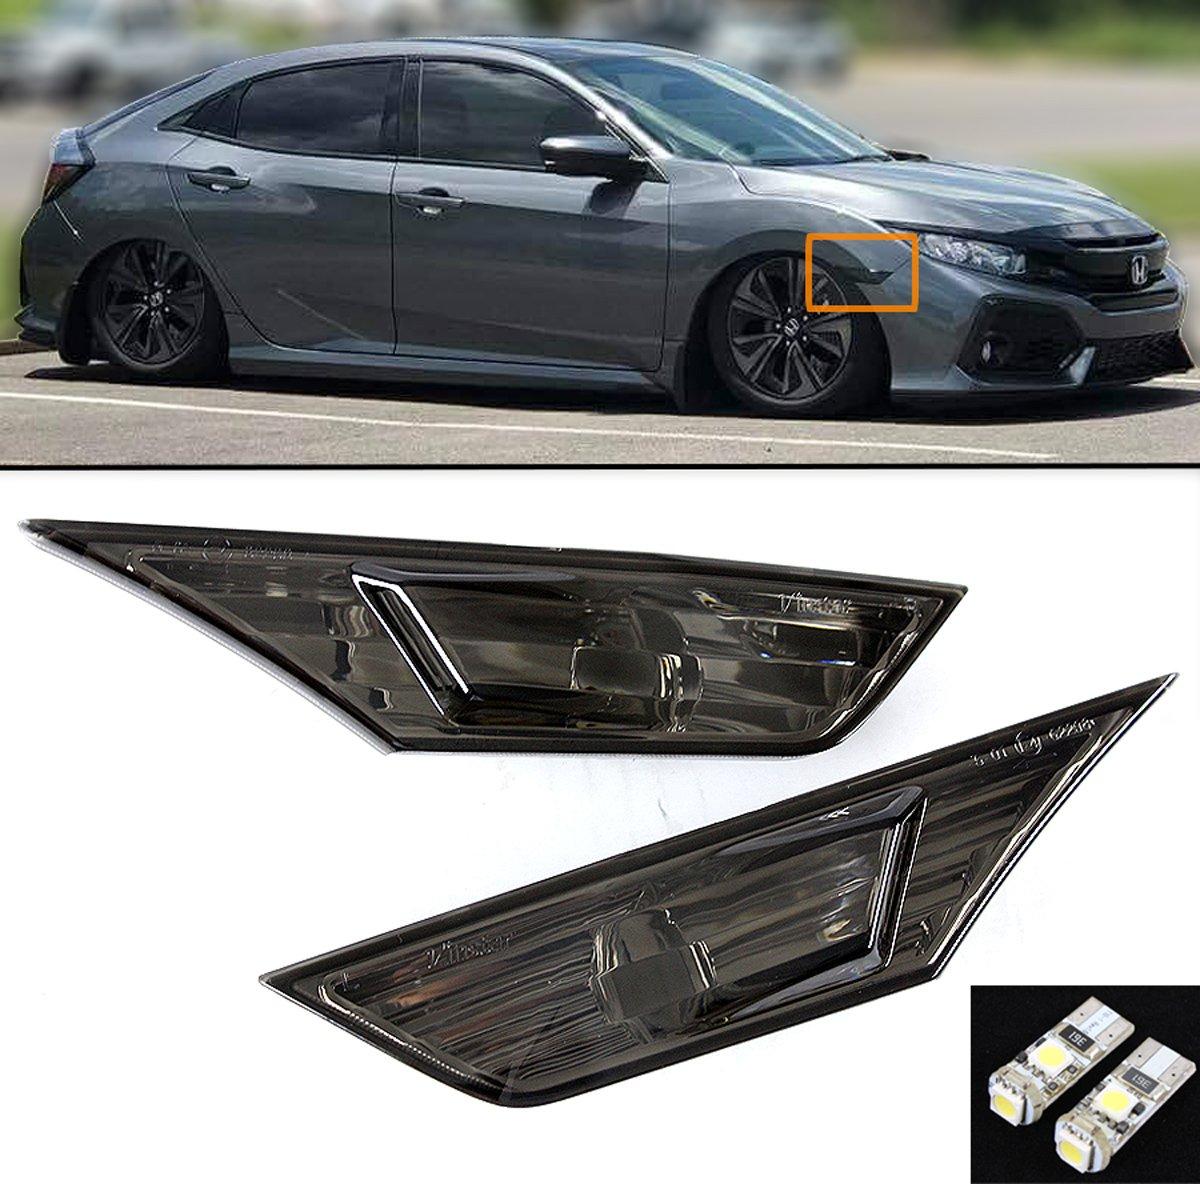 NSLUMO Front White LED Side Marker Lights for Honda Civic 10th Gen 2016-2021 Coupe Hatchback with 2Pcs T10 Light Bulbs OEM#H02551127N Clear Lens